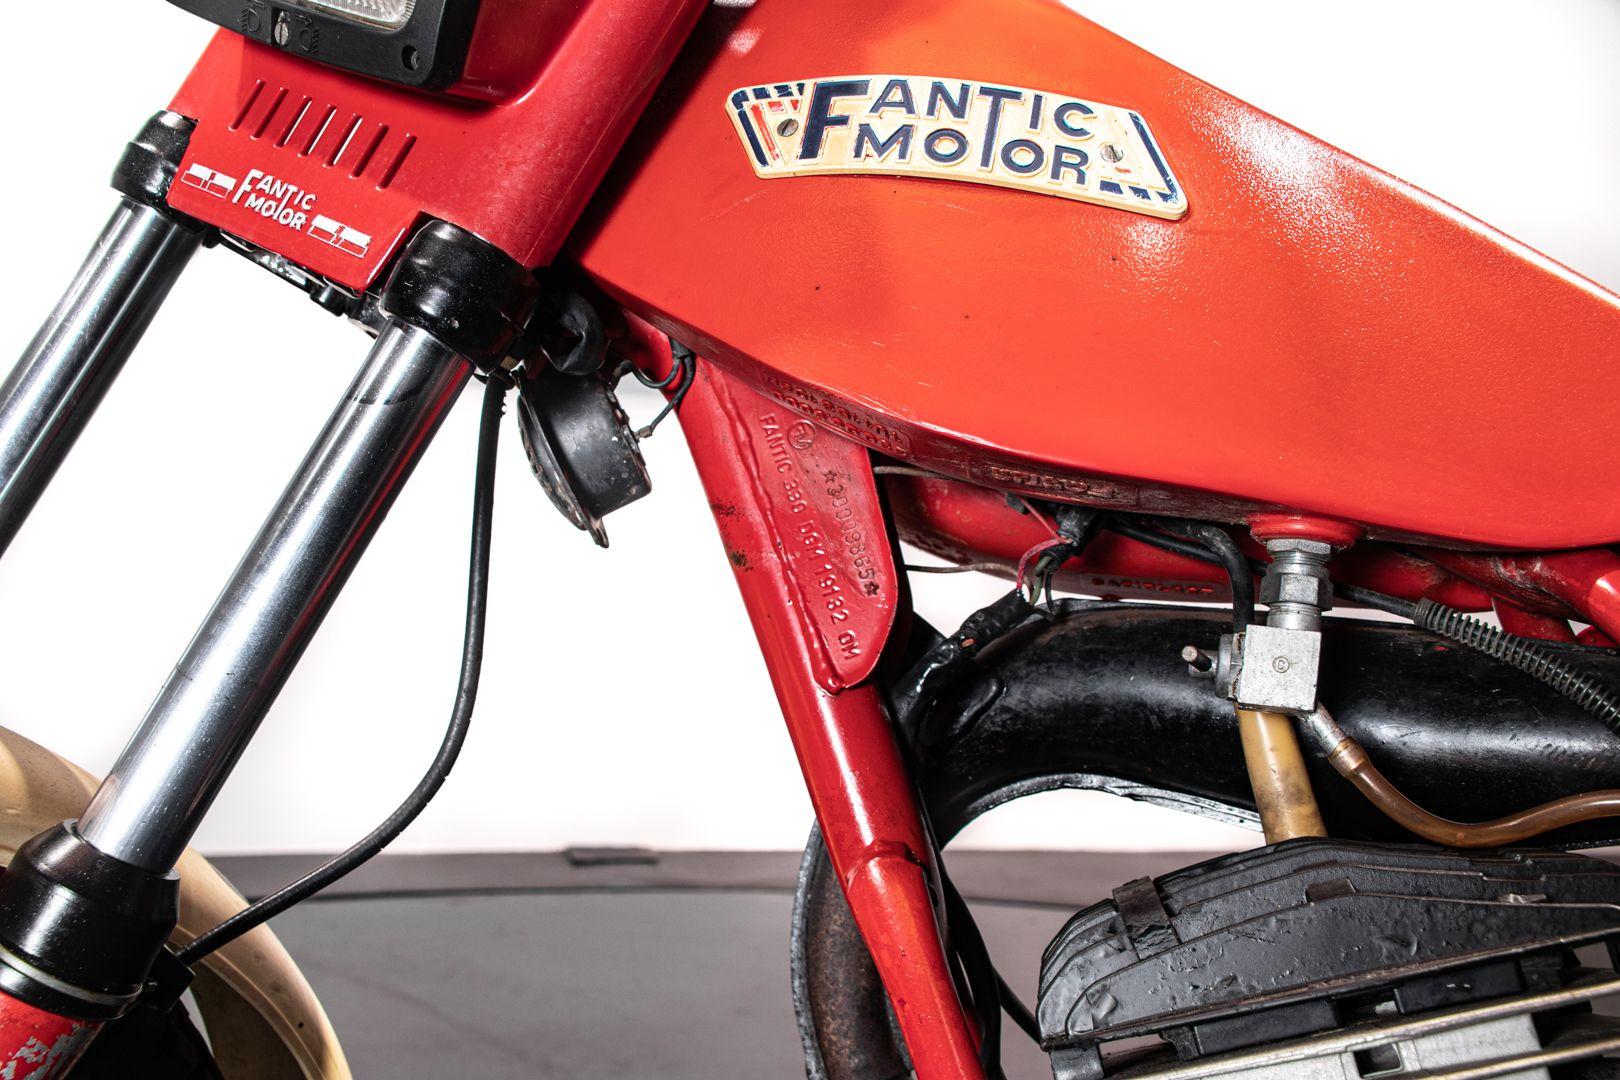 1984 Fantic Motor Trial 50 330 66855